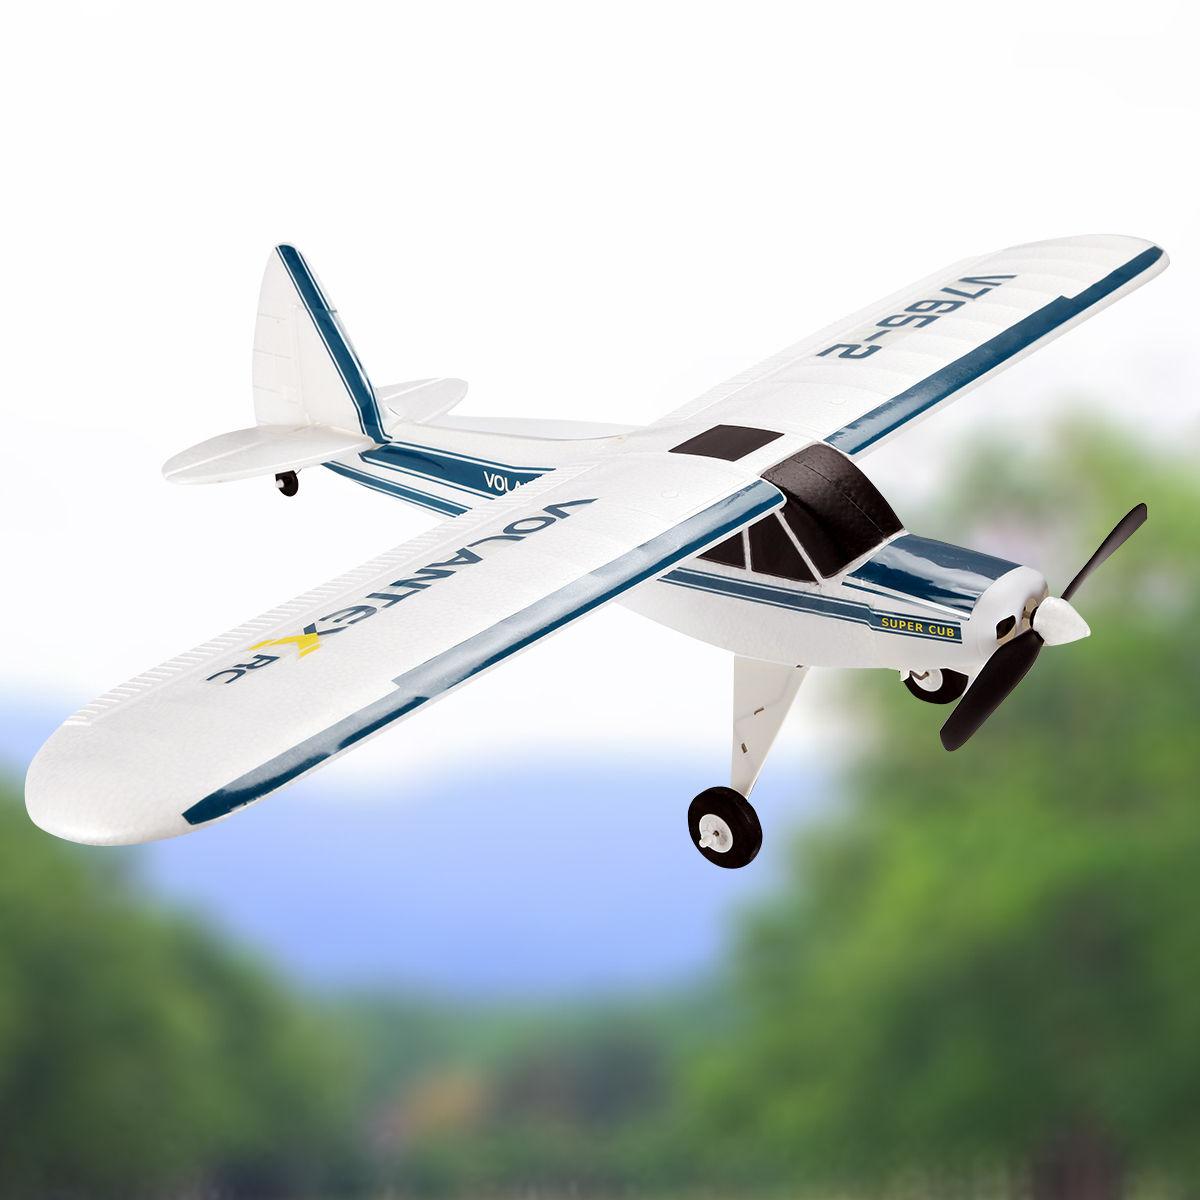 Costway Volantex Super Cub RC Plane 2.4G 4CH Airplane RTF...